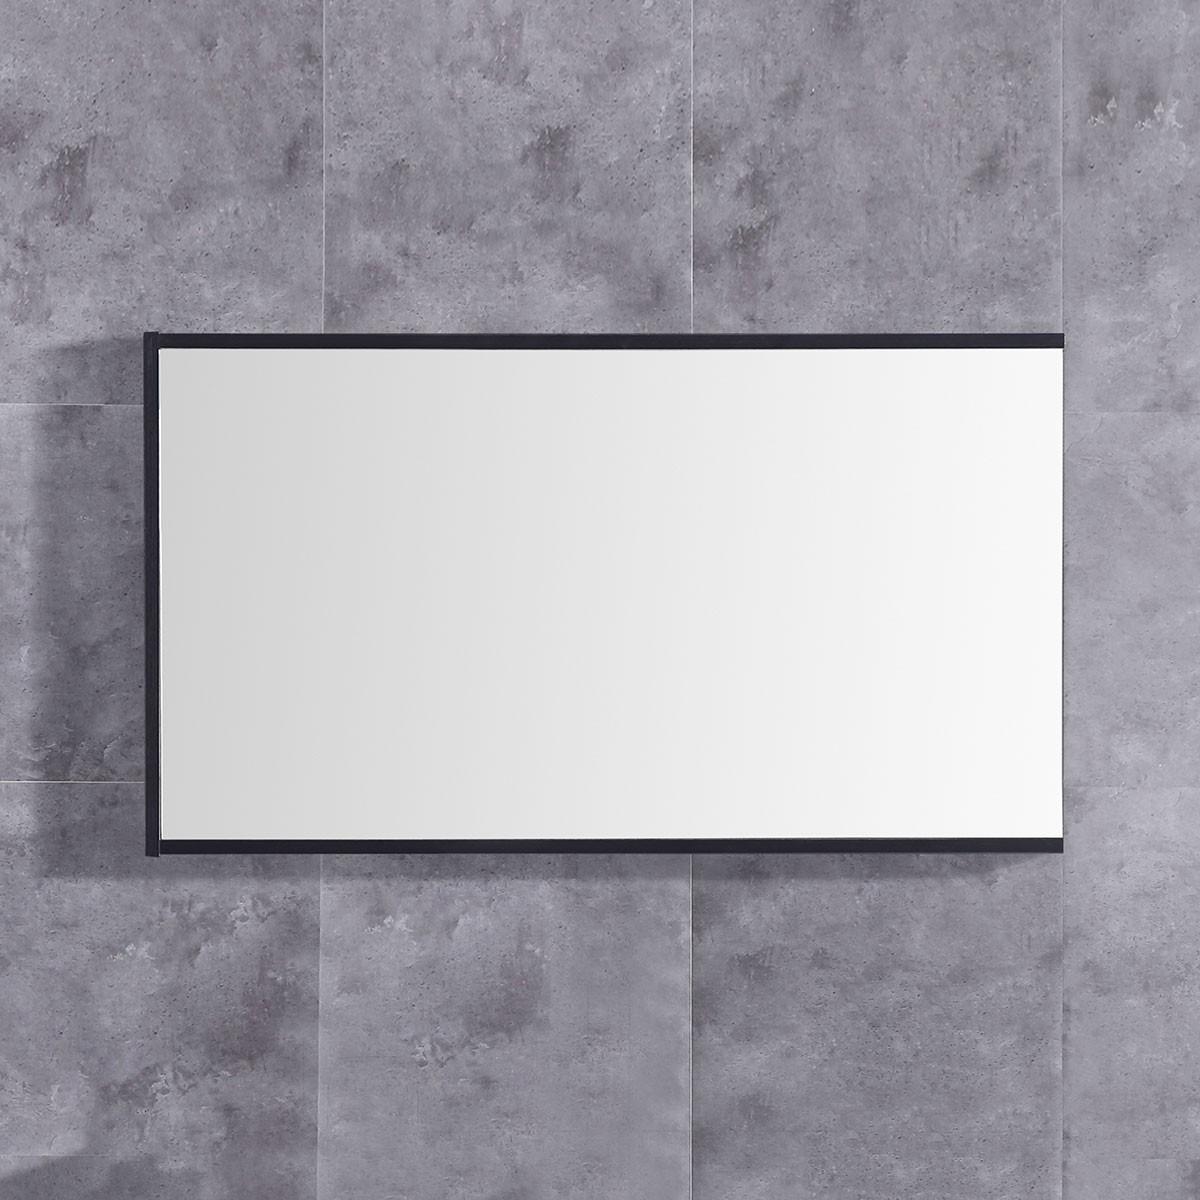 40 x 28 In.Wood Frame Mirror (DK-TH9032-M)